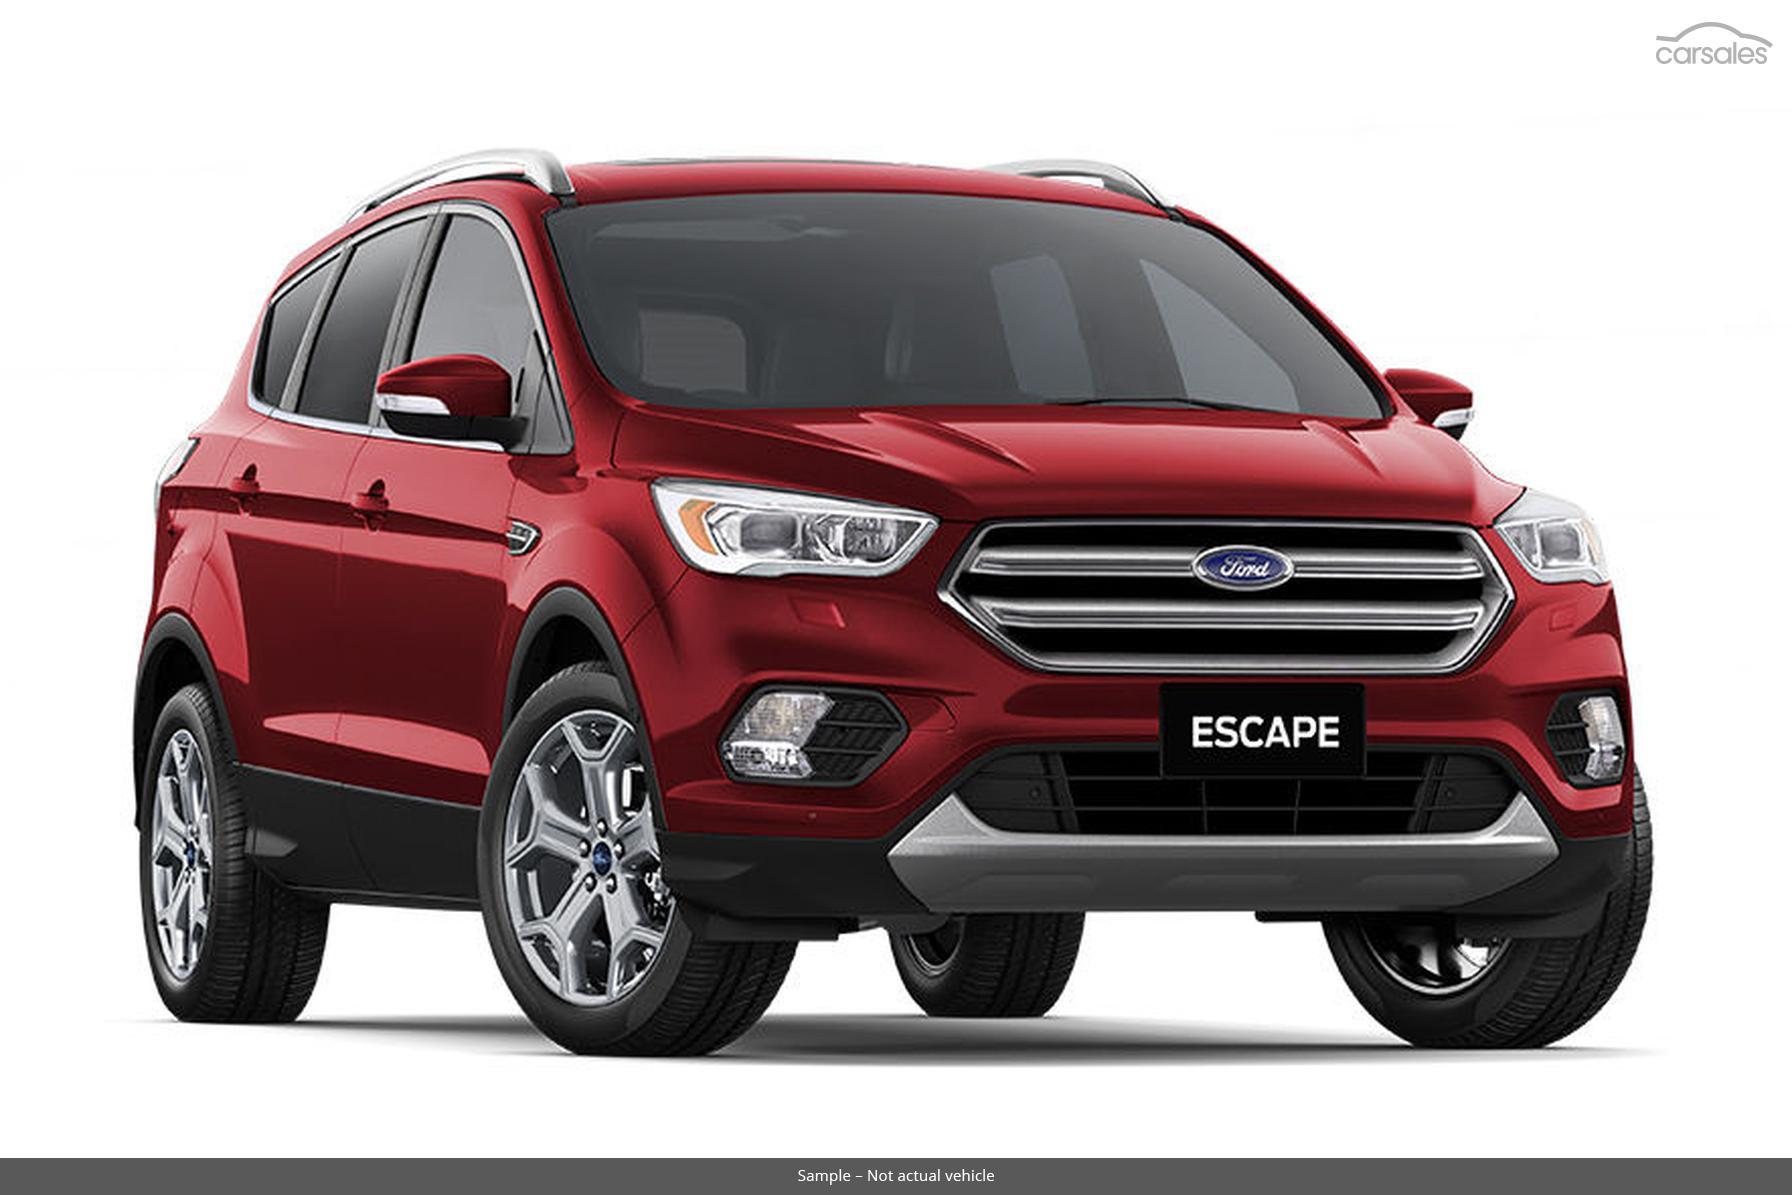 2018 Ford Escape Anium Zg Auto Awd My18 Shrm Ad 5886777 Cars Au